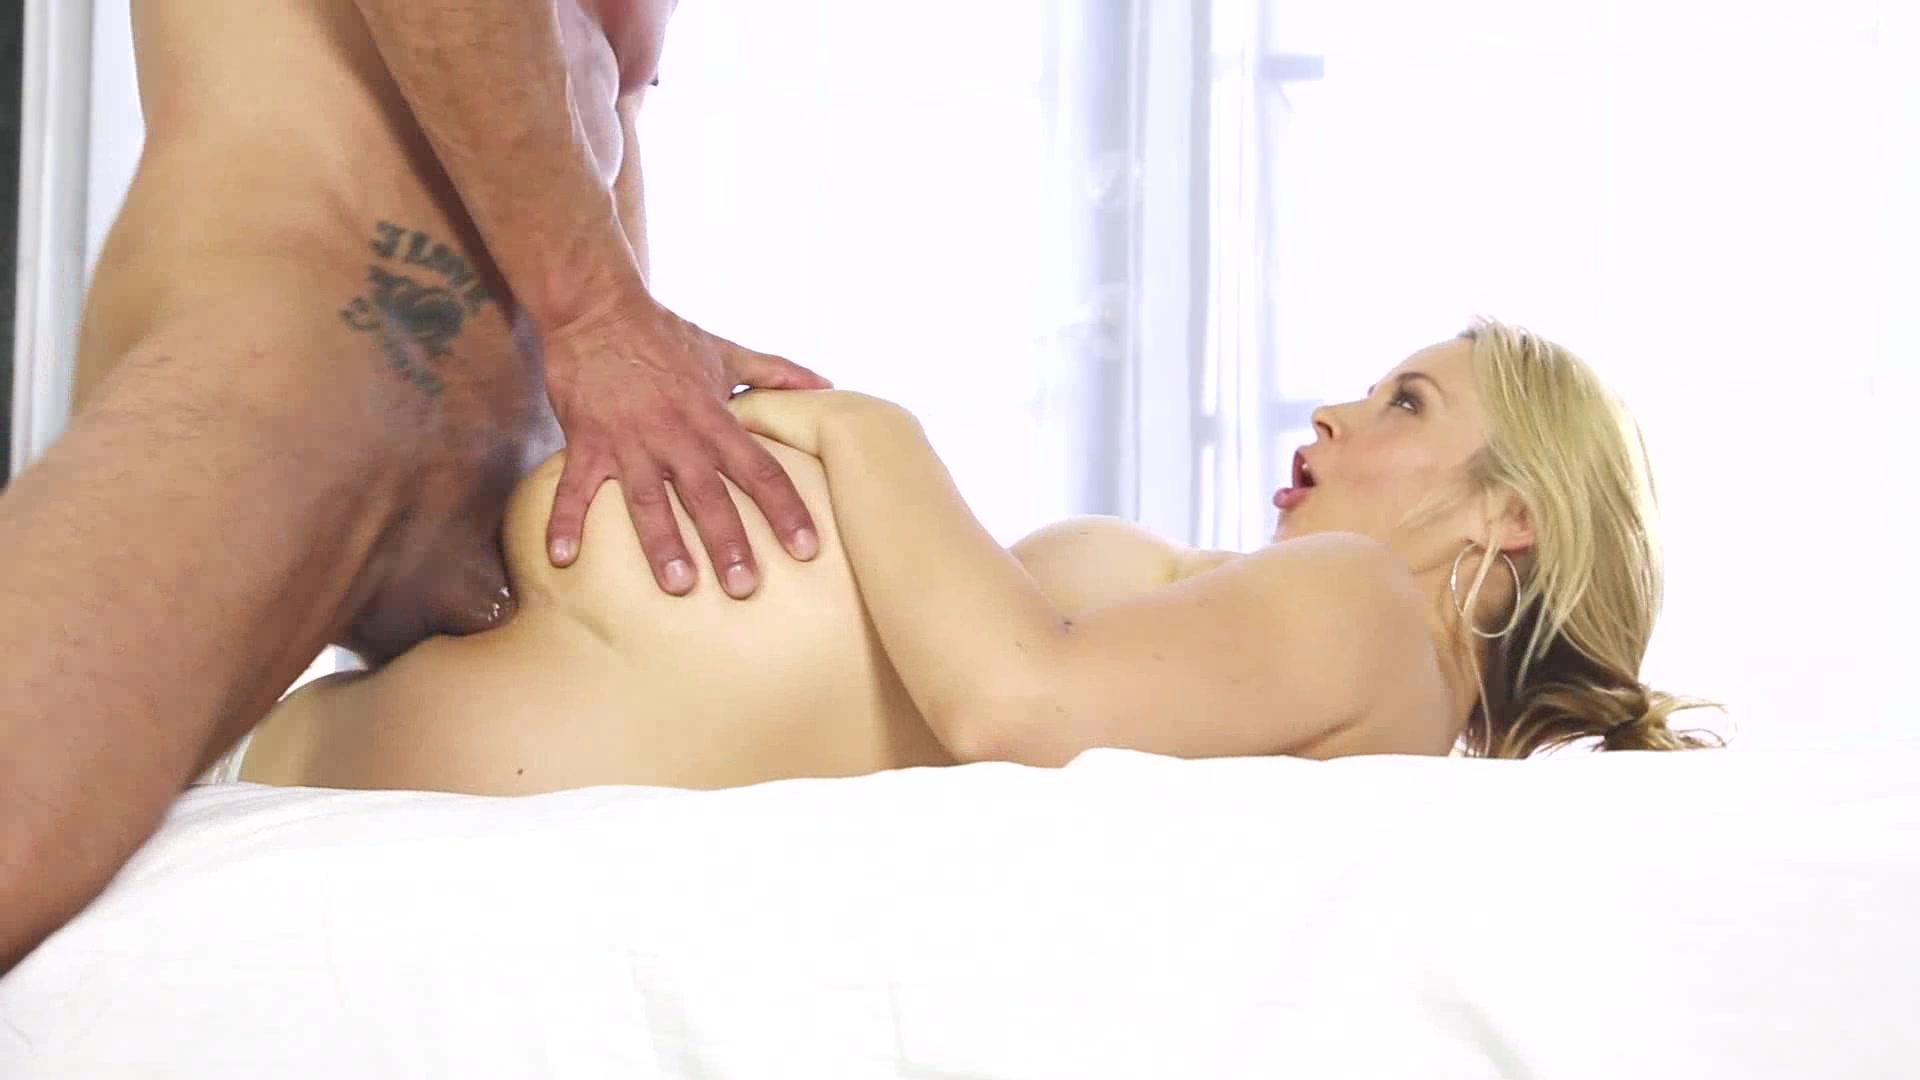 nice nude female ass